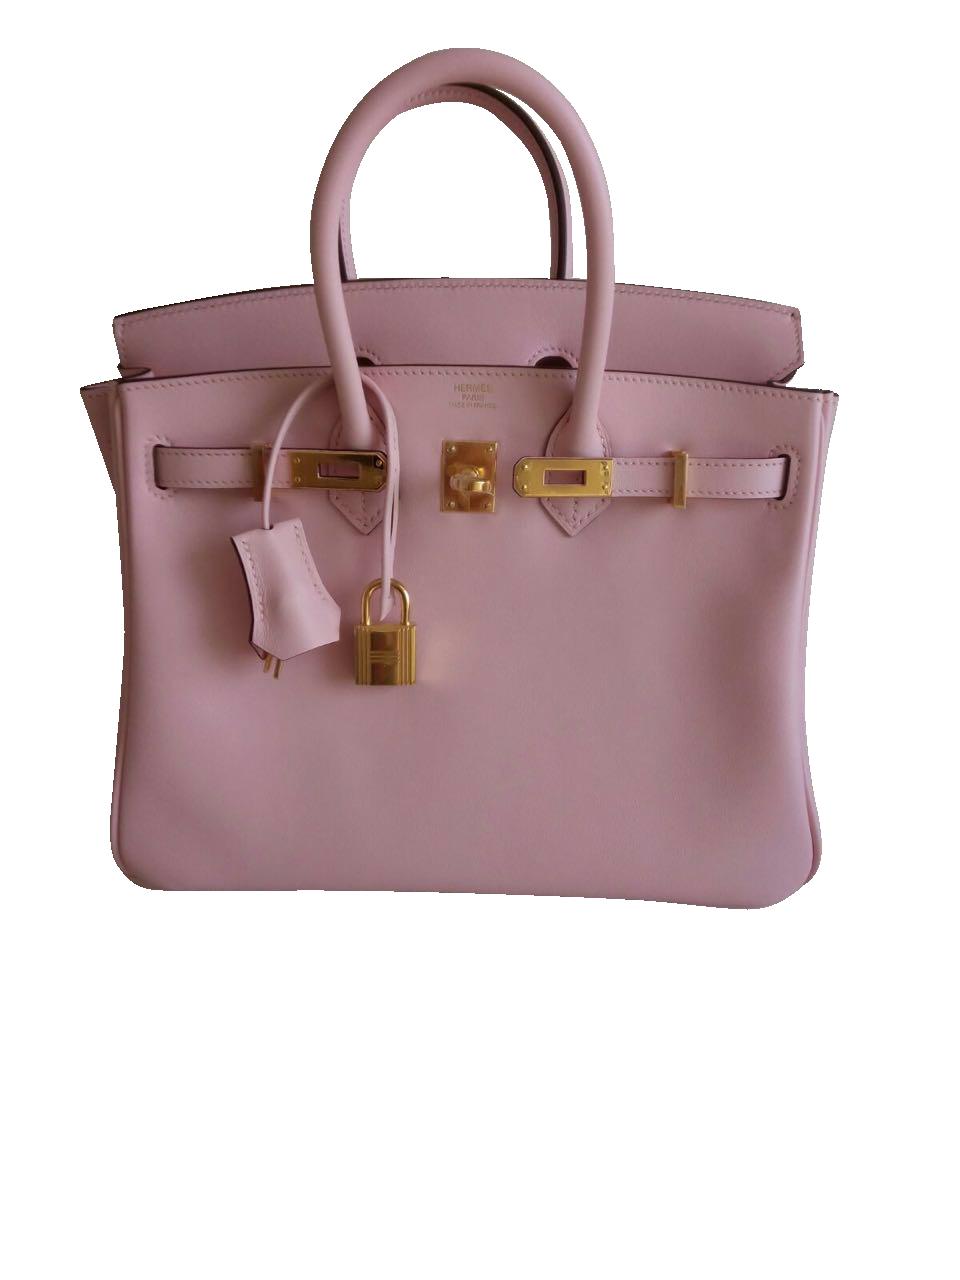 Hermès Birkin 25 Rose Sakura